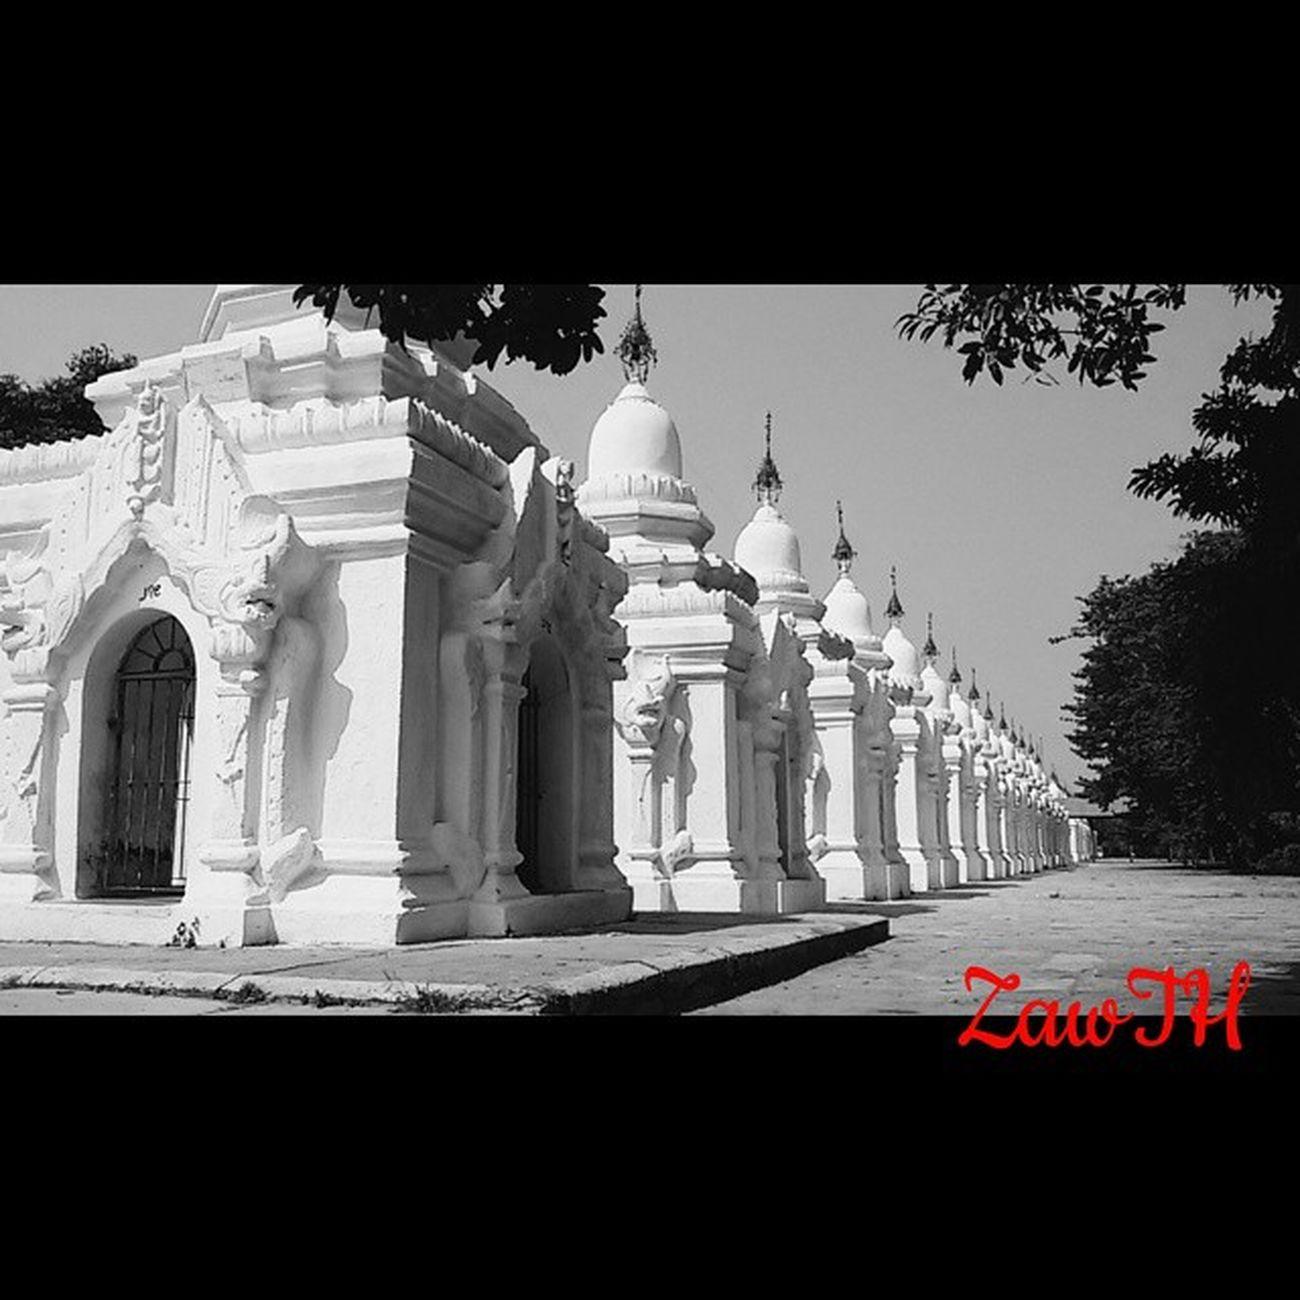 The Kuthodaw (The Royal Merit) Mandalay Myanmar Igersmandalay Igersmyanmar Vscomyanmar Ig_worldphoto Ig_great_shot_fla Ig_global_bw Ig_global_bw Zawth Rcnocrop Kuthodaw Royalmerit Aseanchannel Blackvisionprojects Bnw Blackandwhite Respirofotografia Collection_bw Universal_bw Myanmarphoto Vsco_cool Vsco_good Vscocam Pocket_bnw travelgram Collection_bw nothingisordinary nothingisordinary_